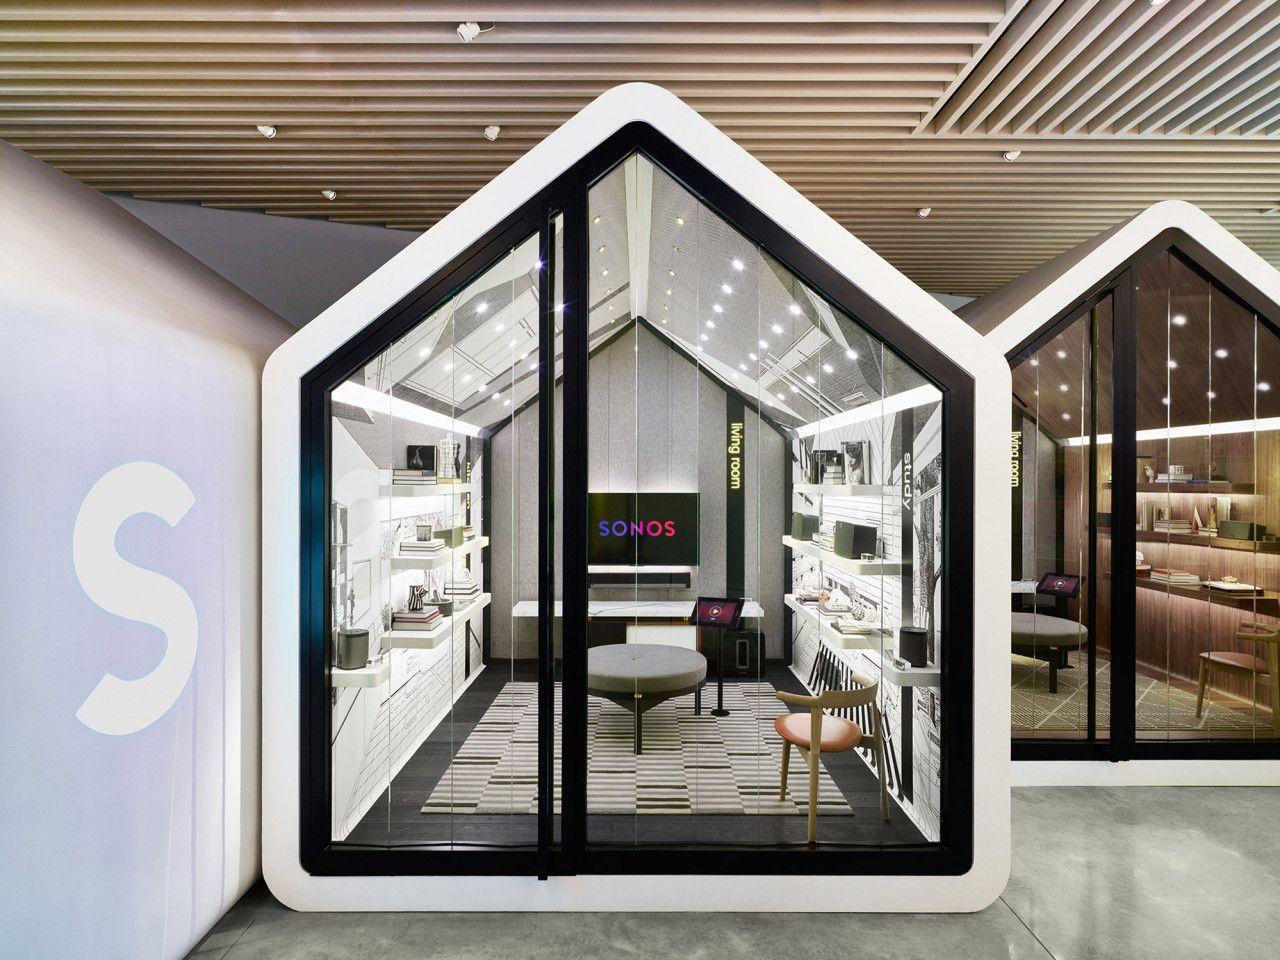 Sonos-Listening-Room-2-Exterior - Design Milk   Retail design, Store design  interior, Retail interior